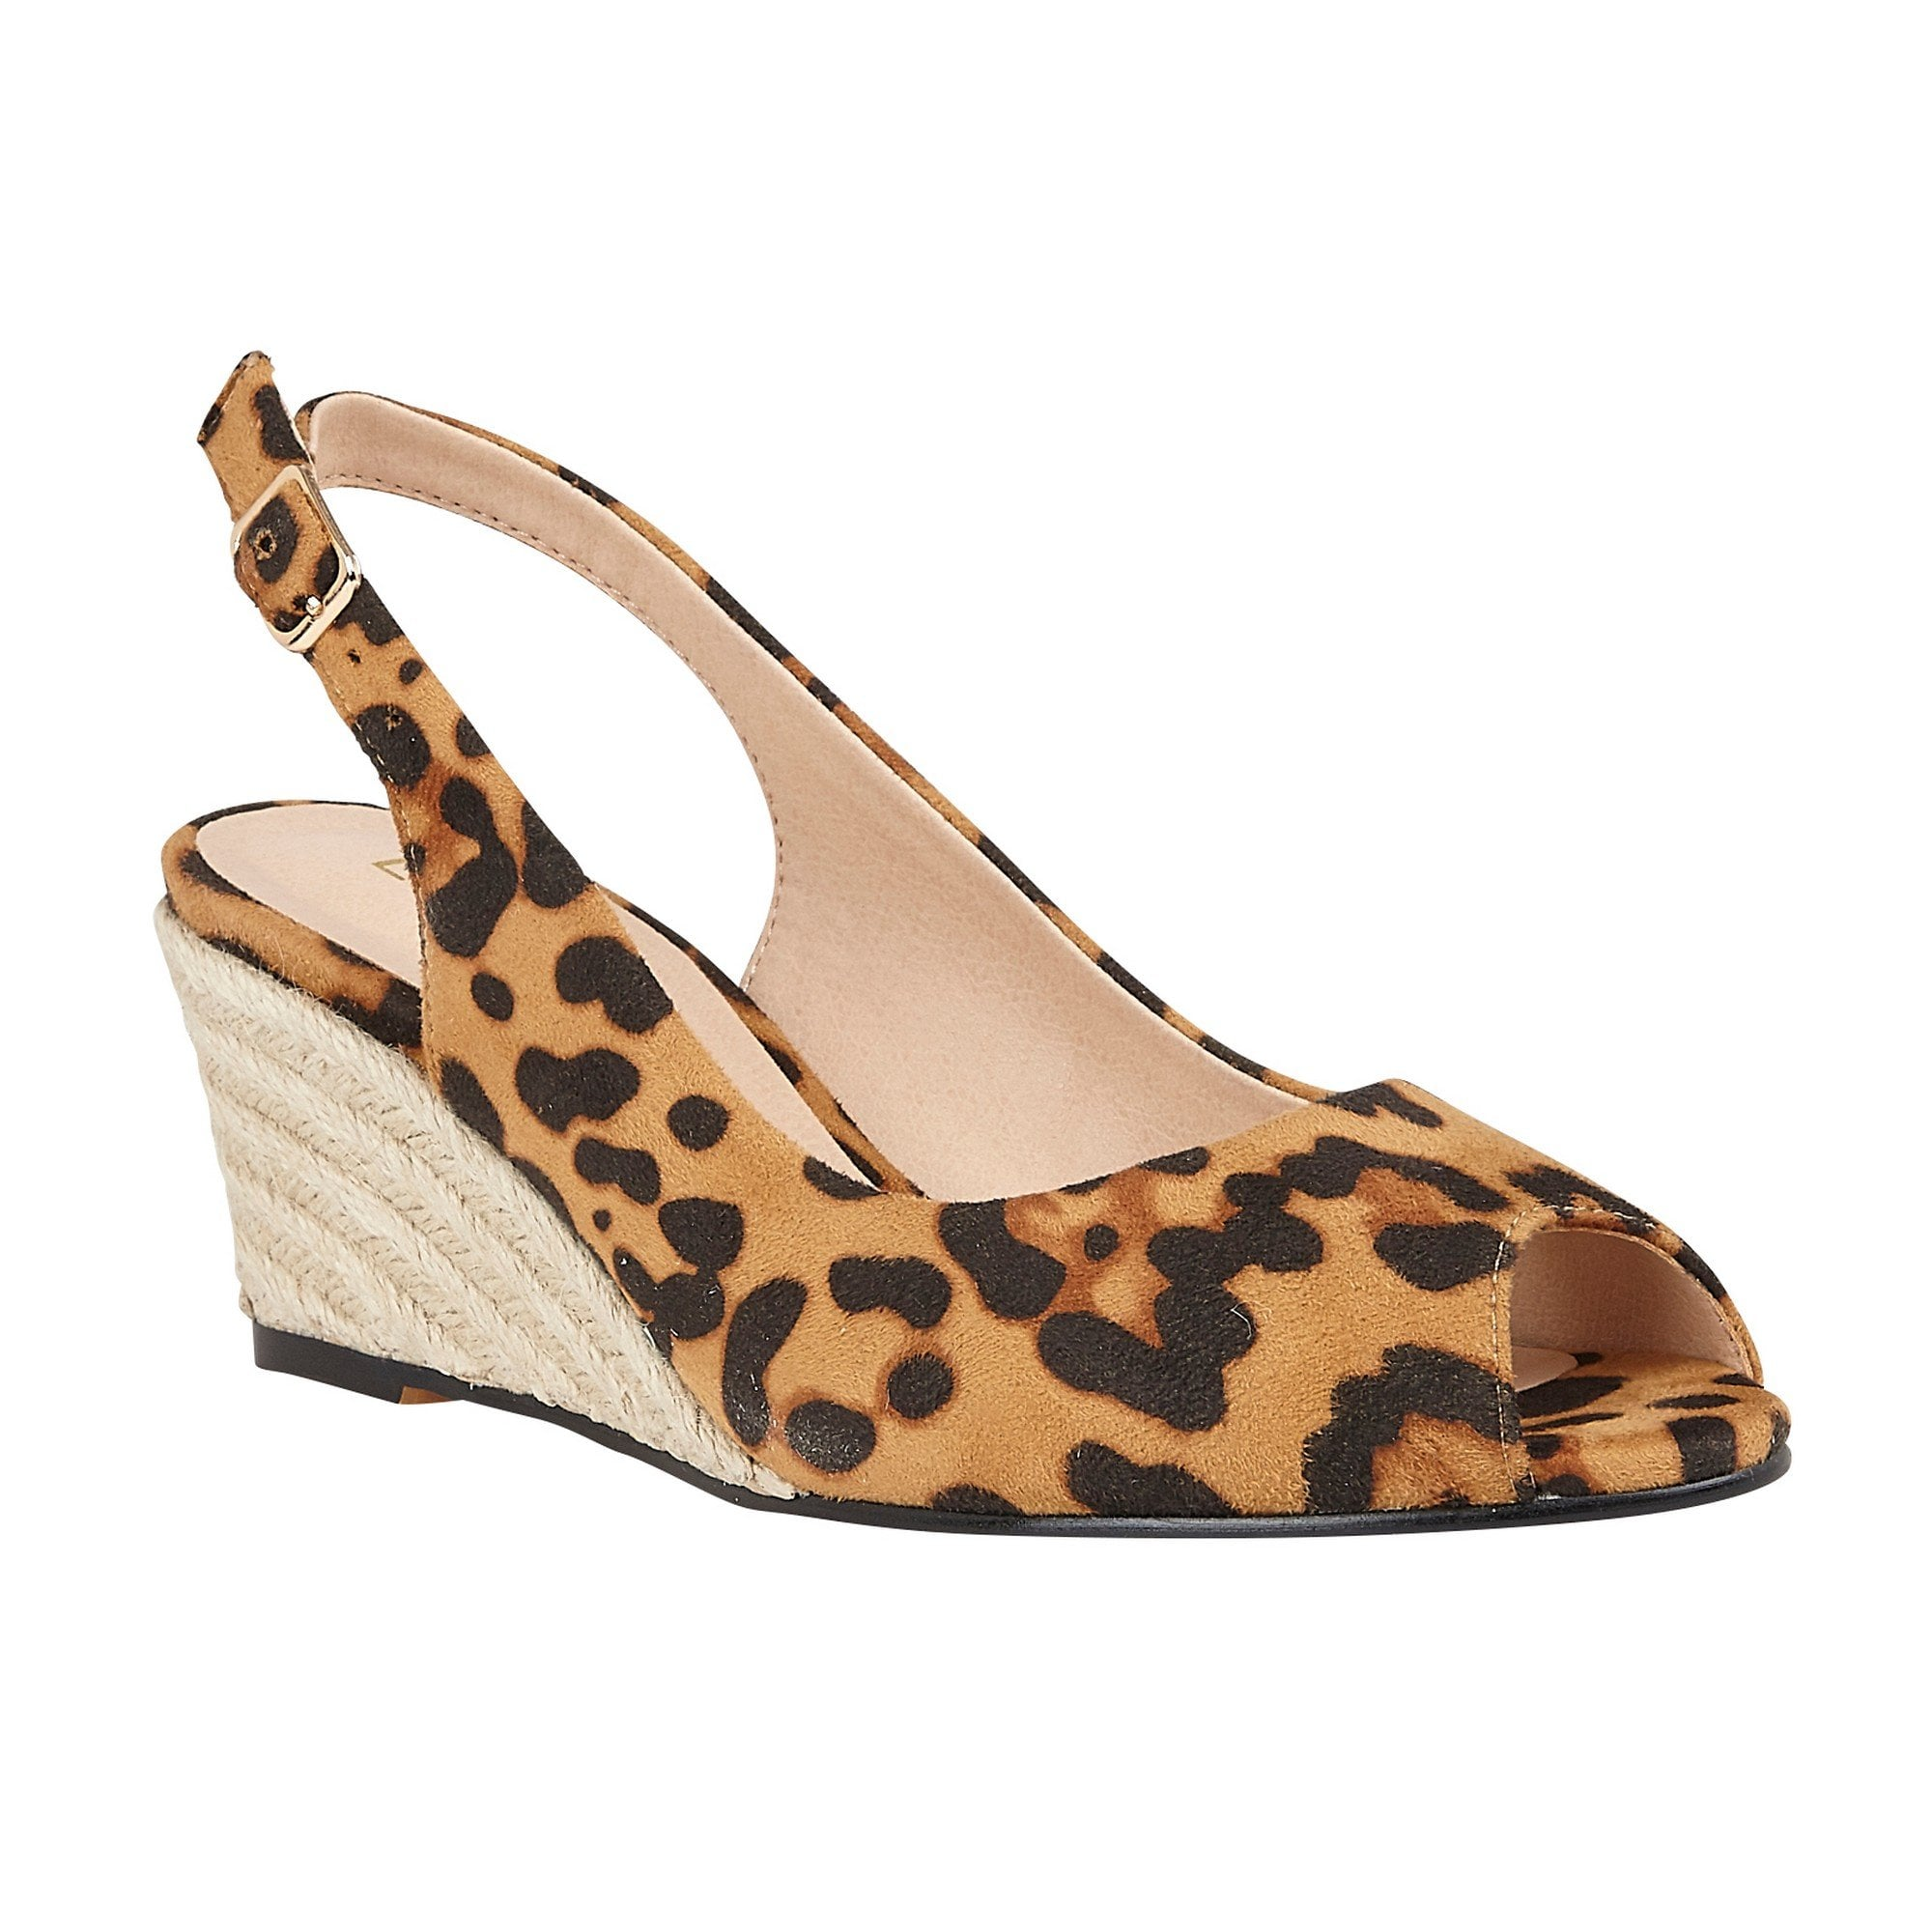 Lotus ladies' Tiffany wedge shoe